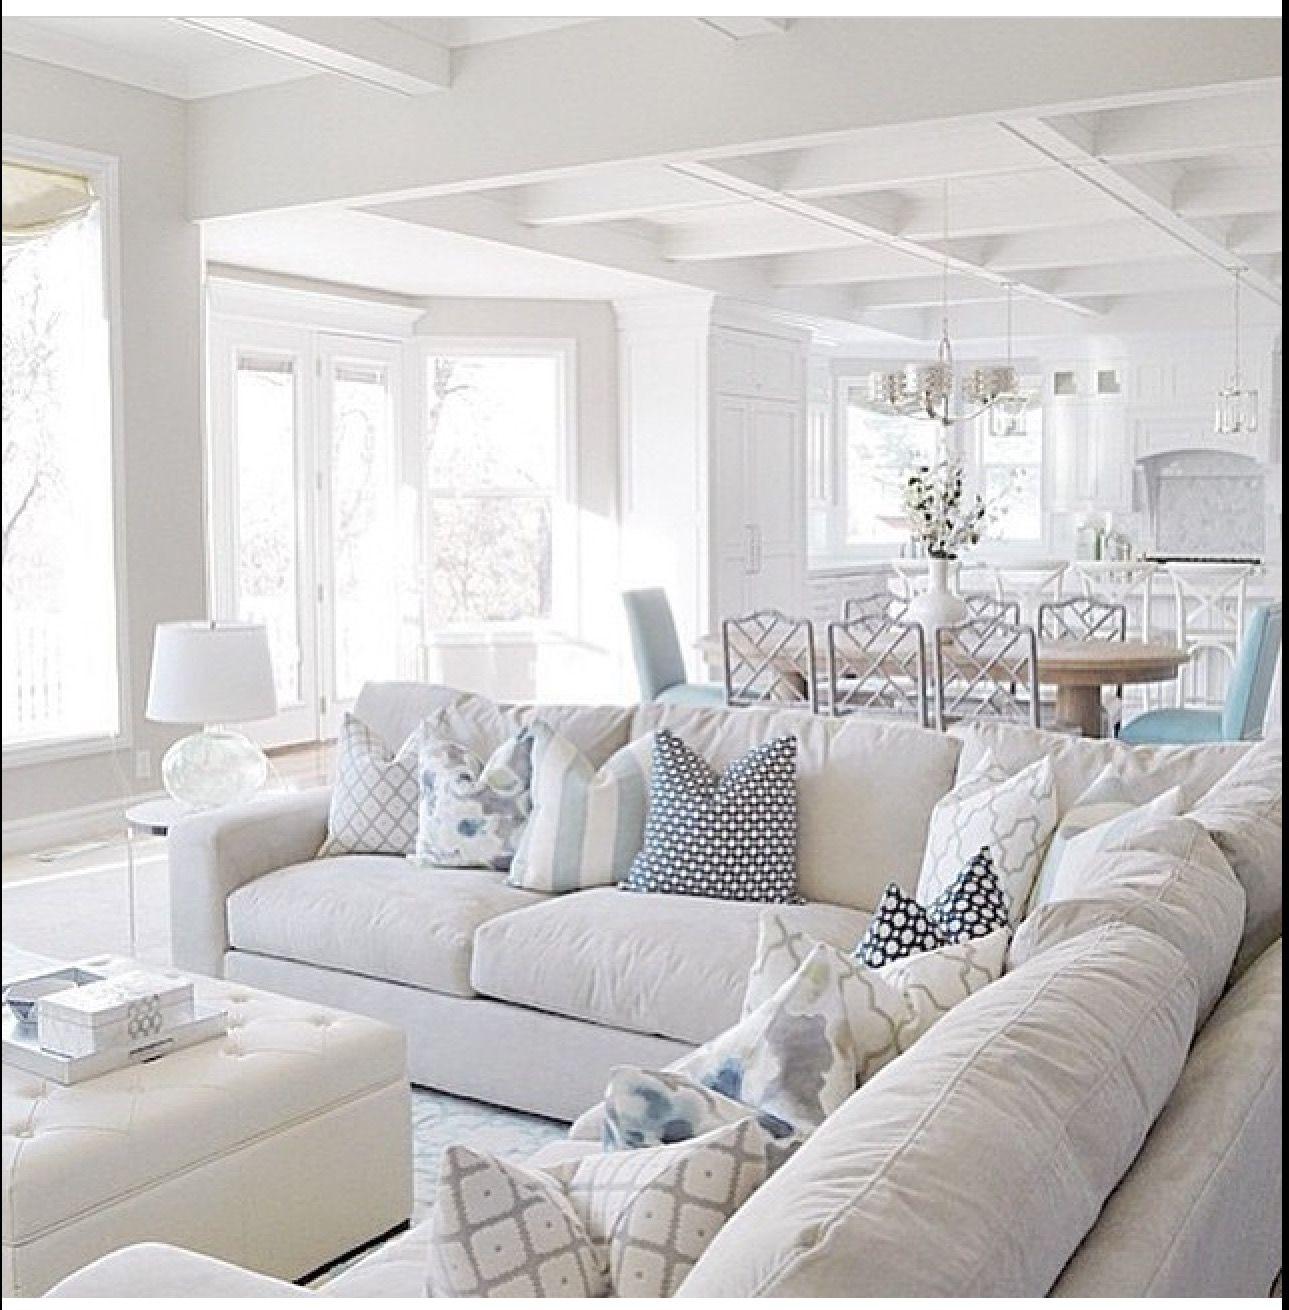 Pin By Ashley Calvi On B E A C H H O U S E Living Room Designs